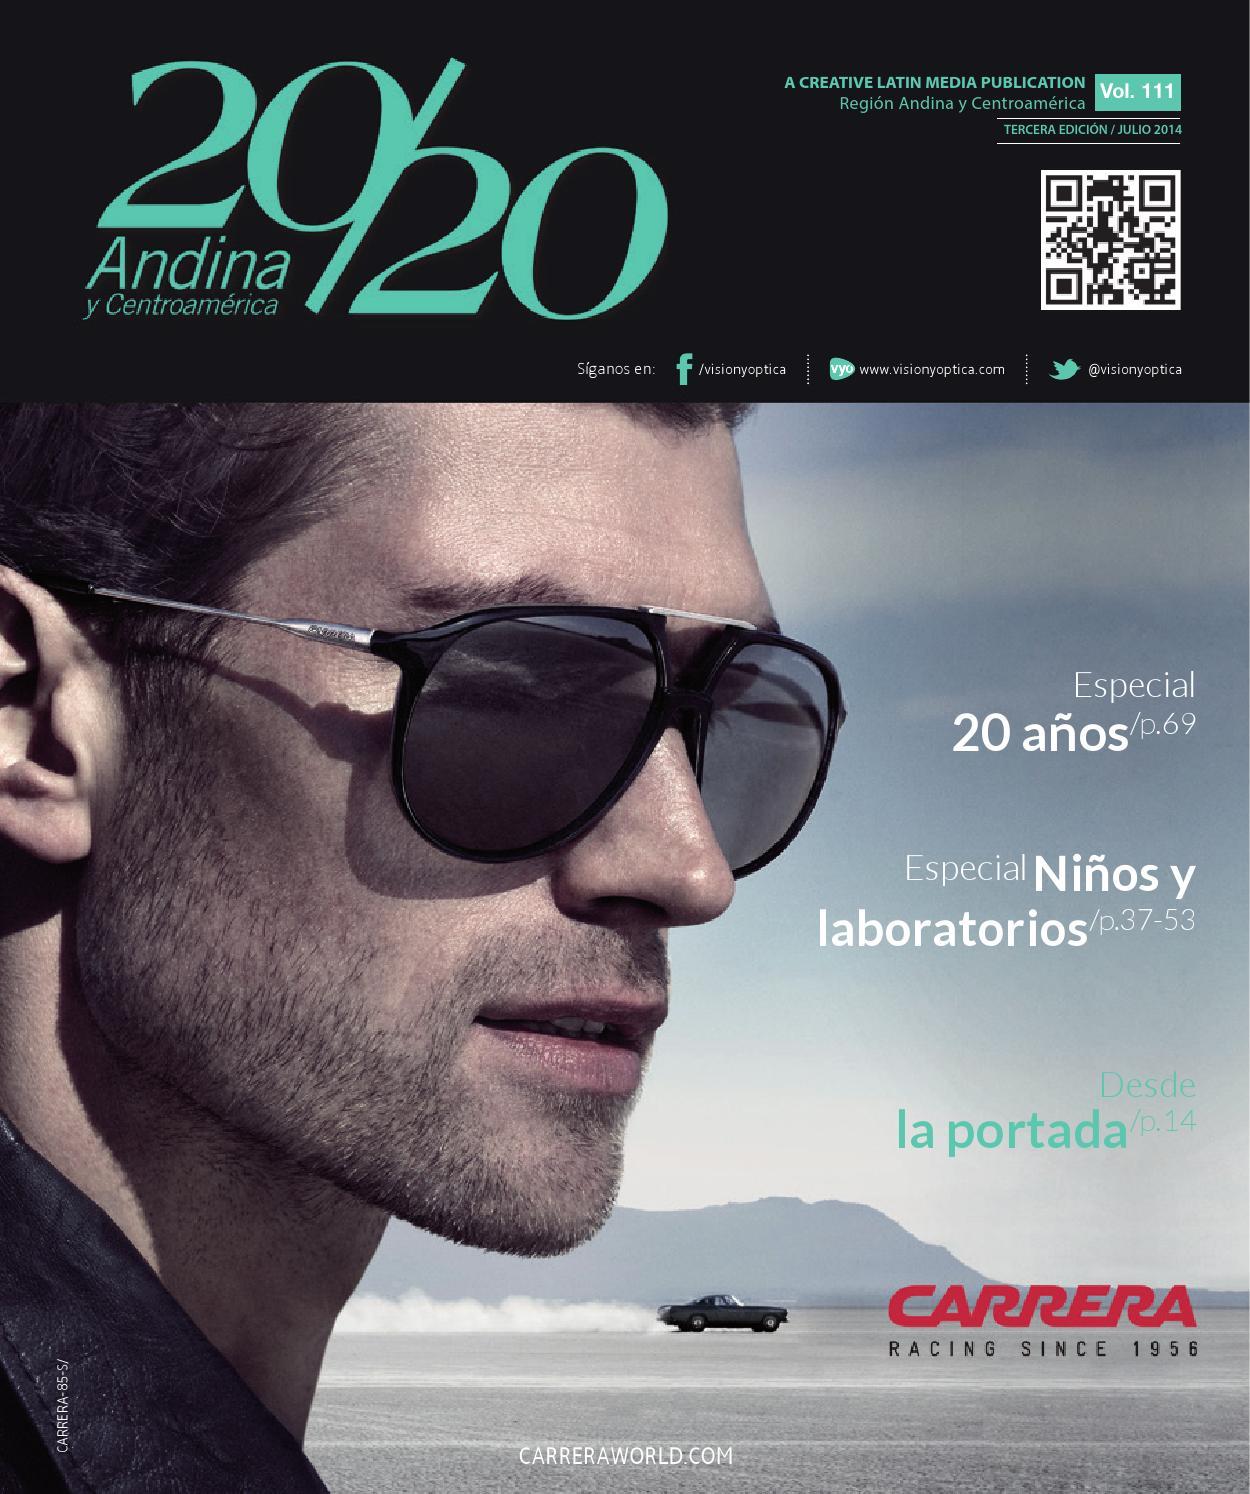 82d4aea8a 2020 3ra 2014 Andina by Creative Latin Media LLC - issuu